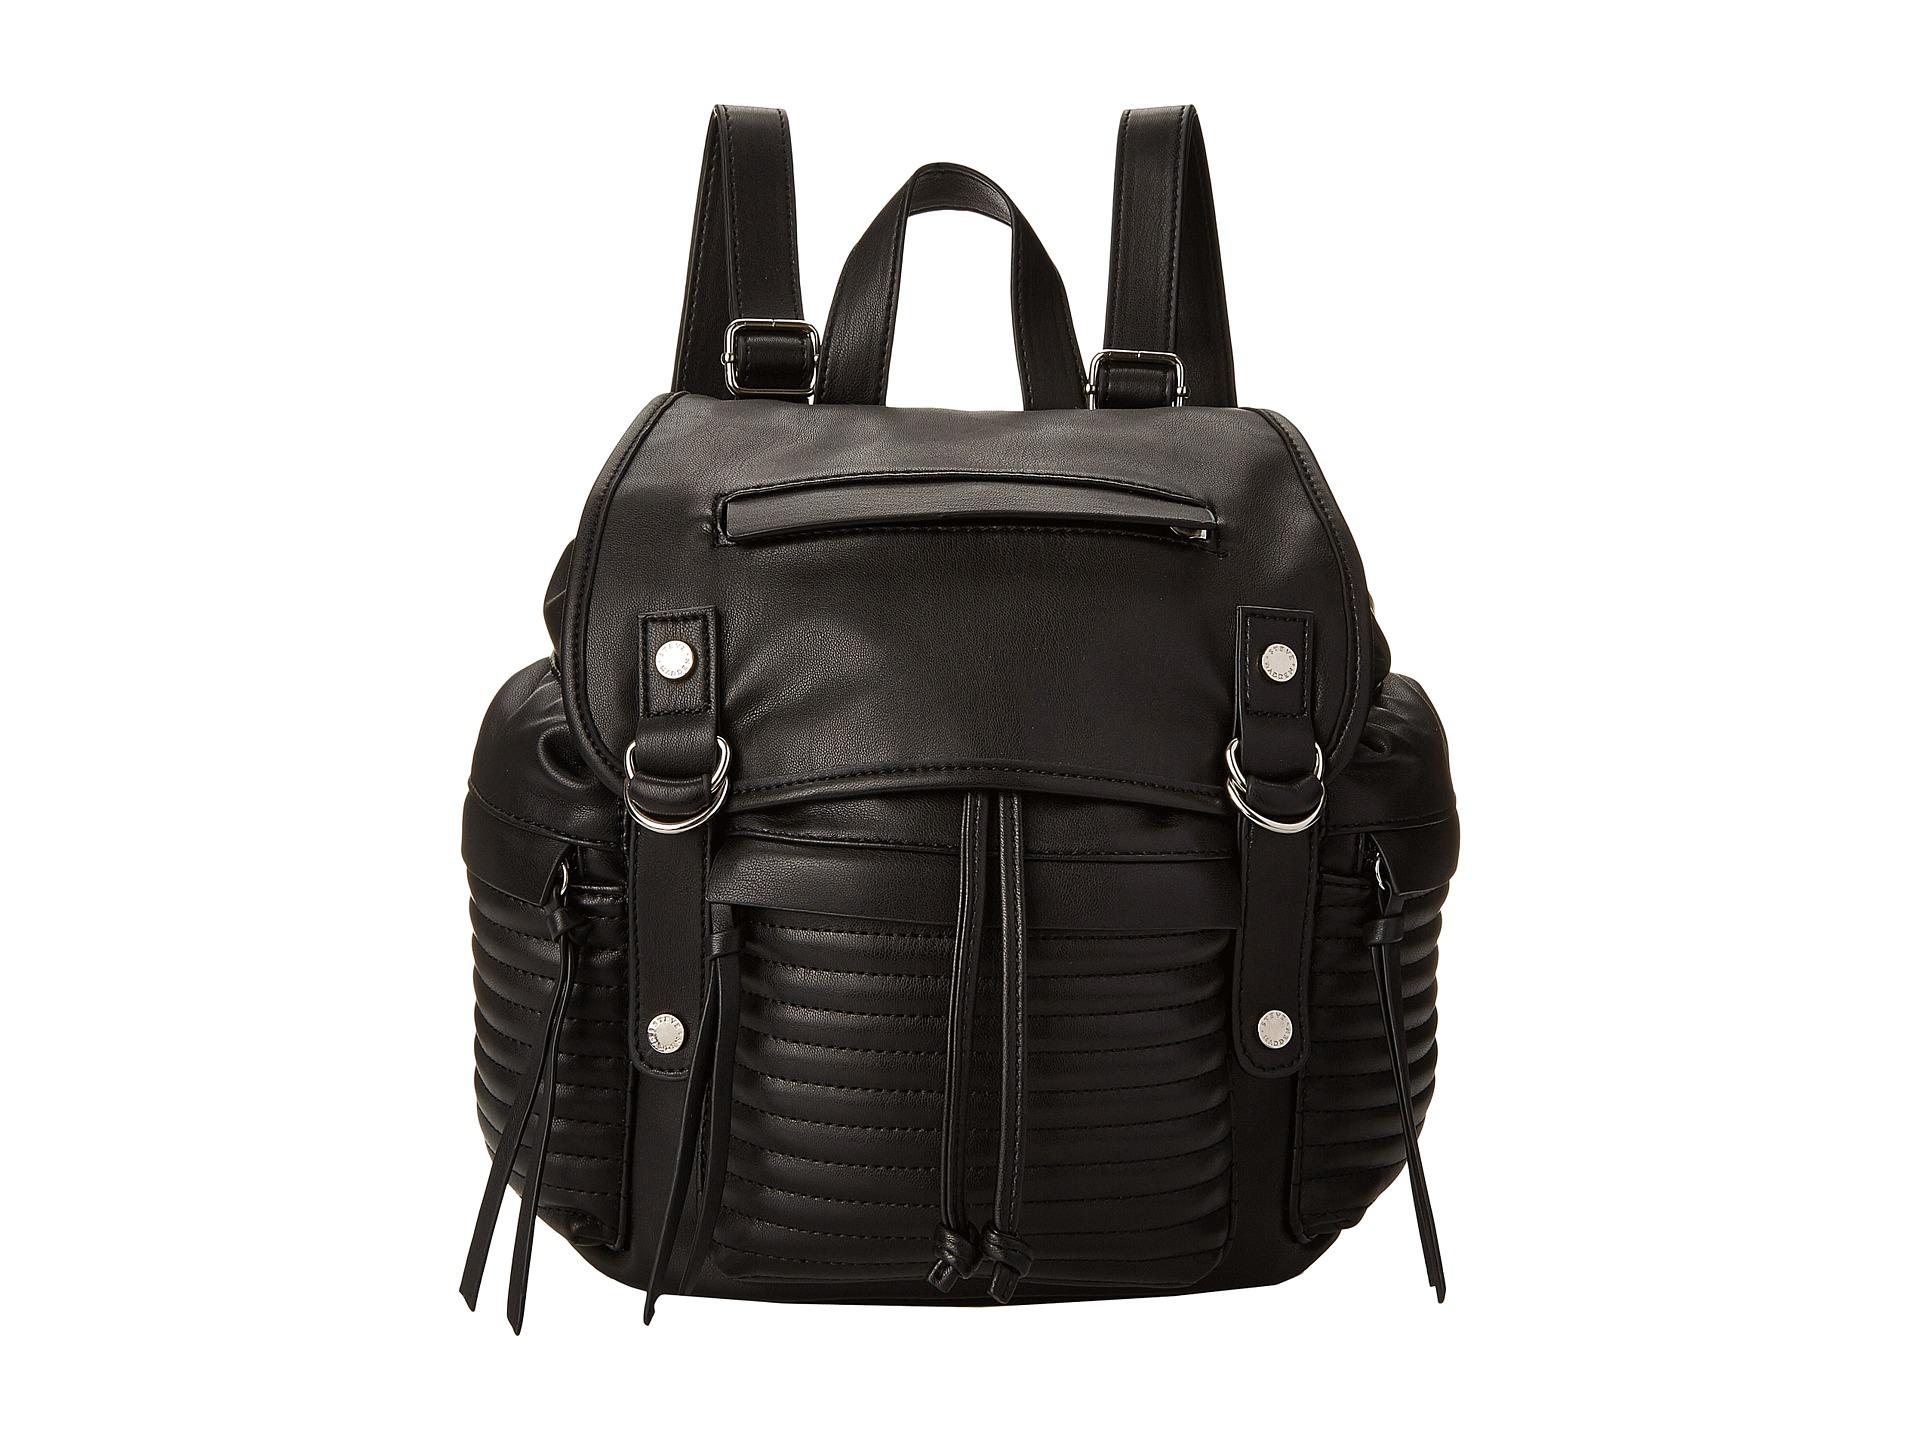 Steve Madden Broller Quilted Backpack In Black Lyst